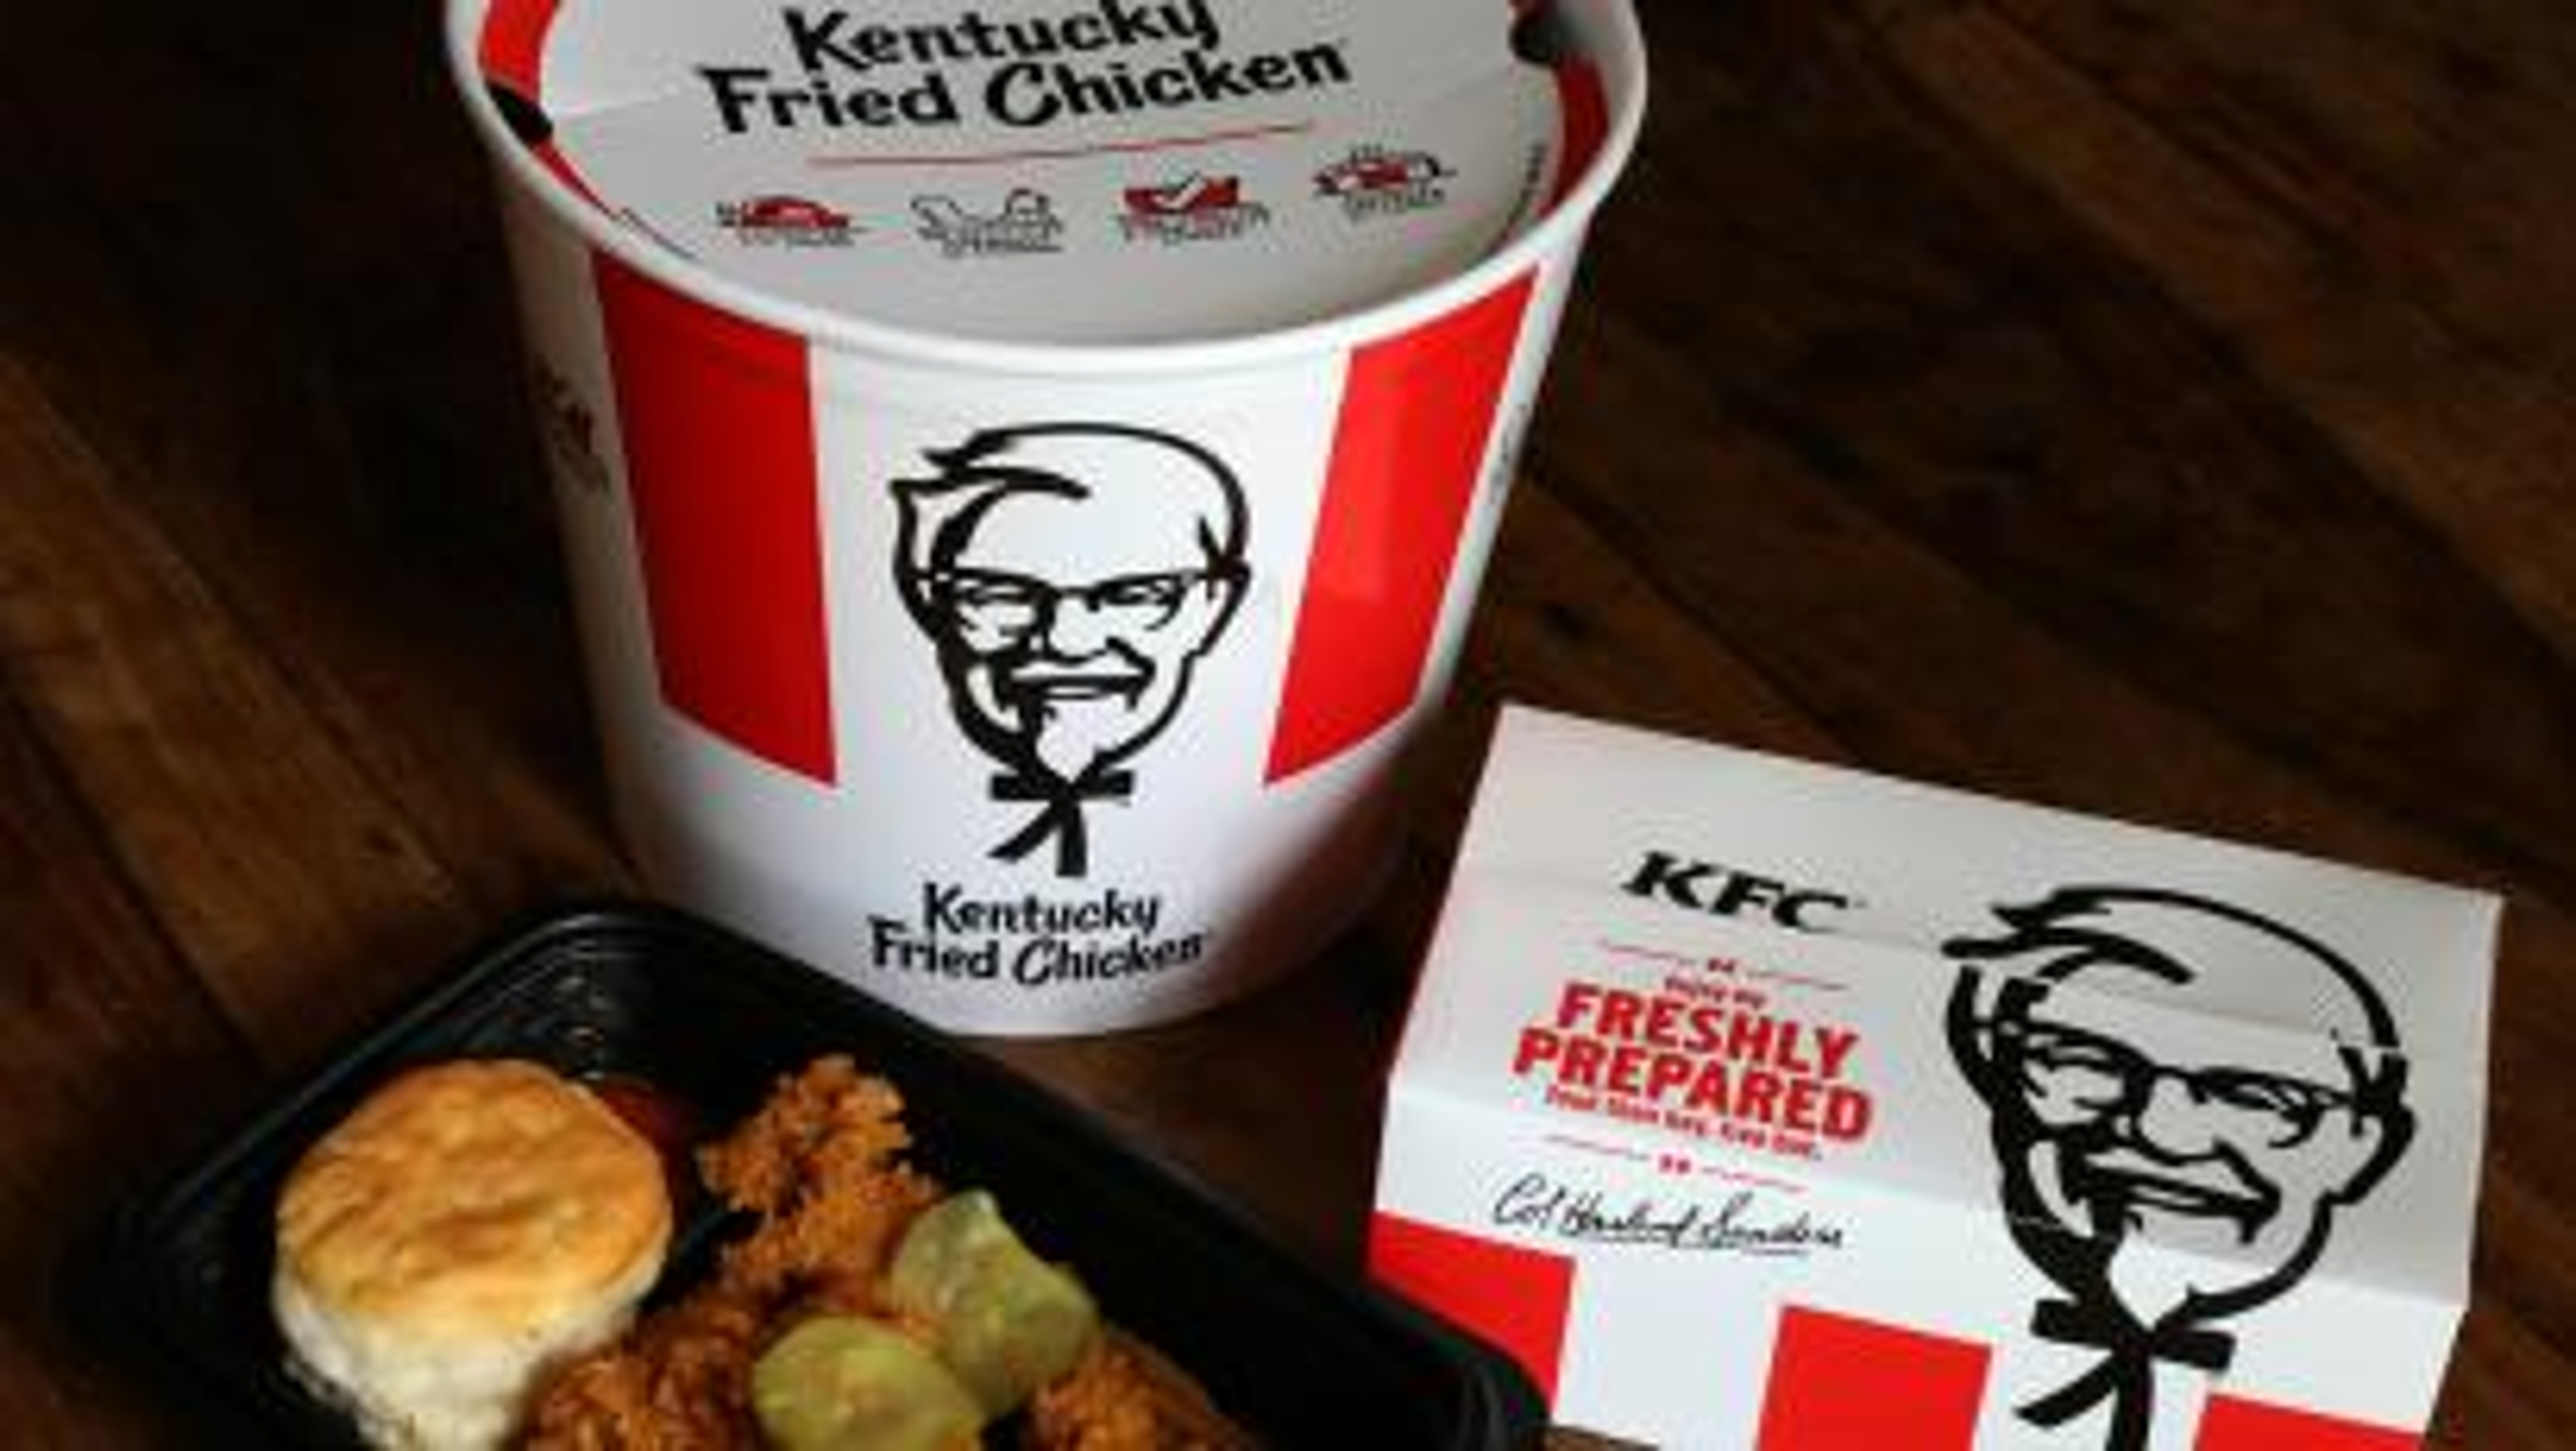 Kentucky Fried Chicken (KFC) bucket and box of chicken